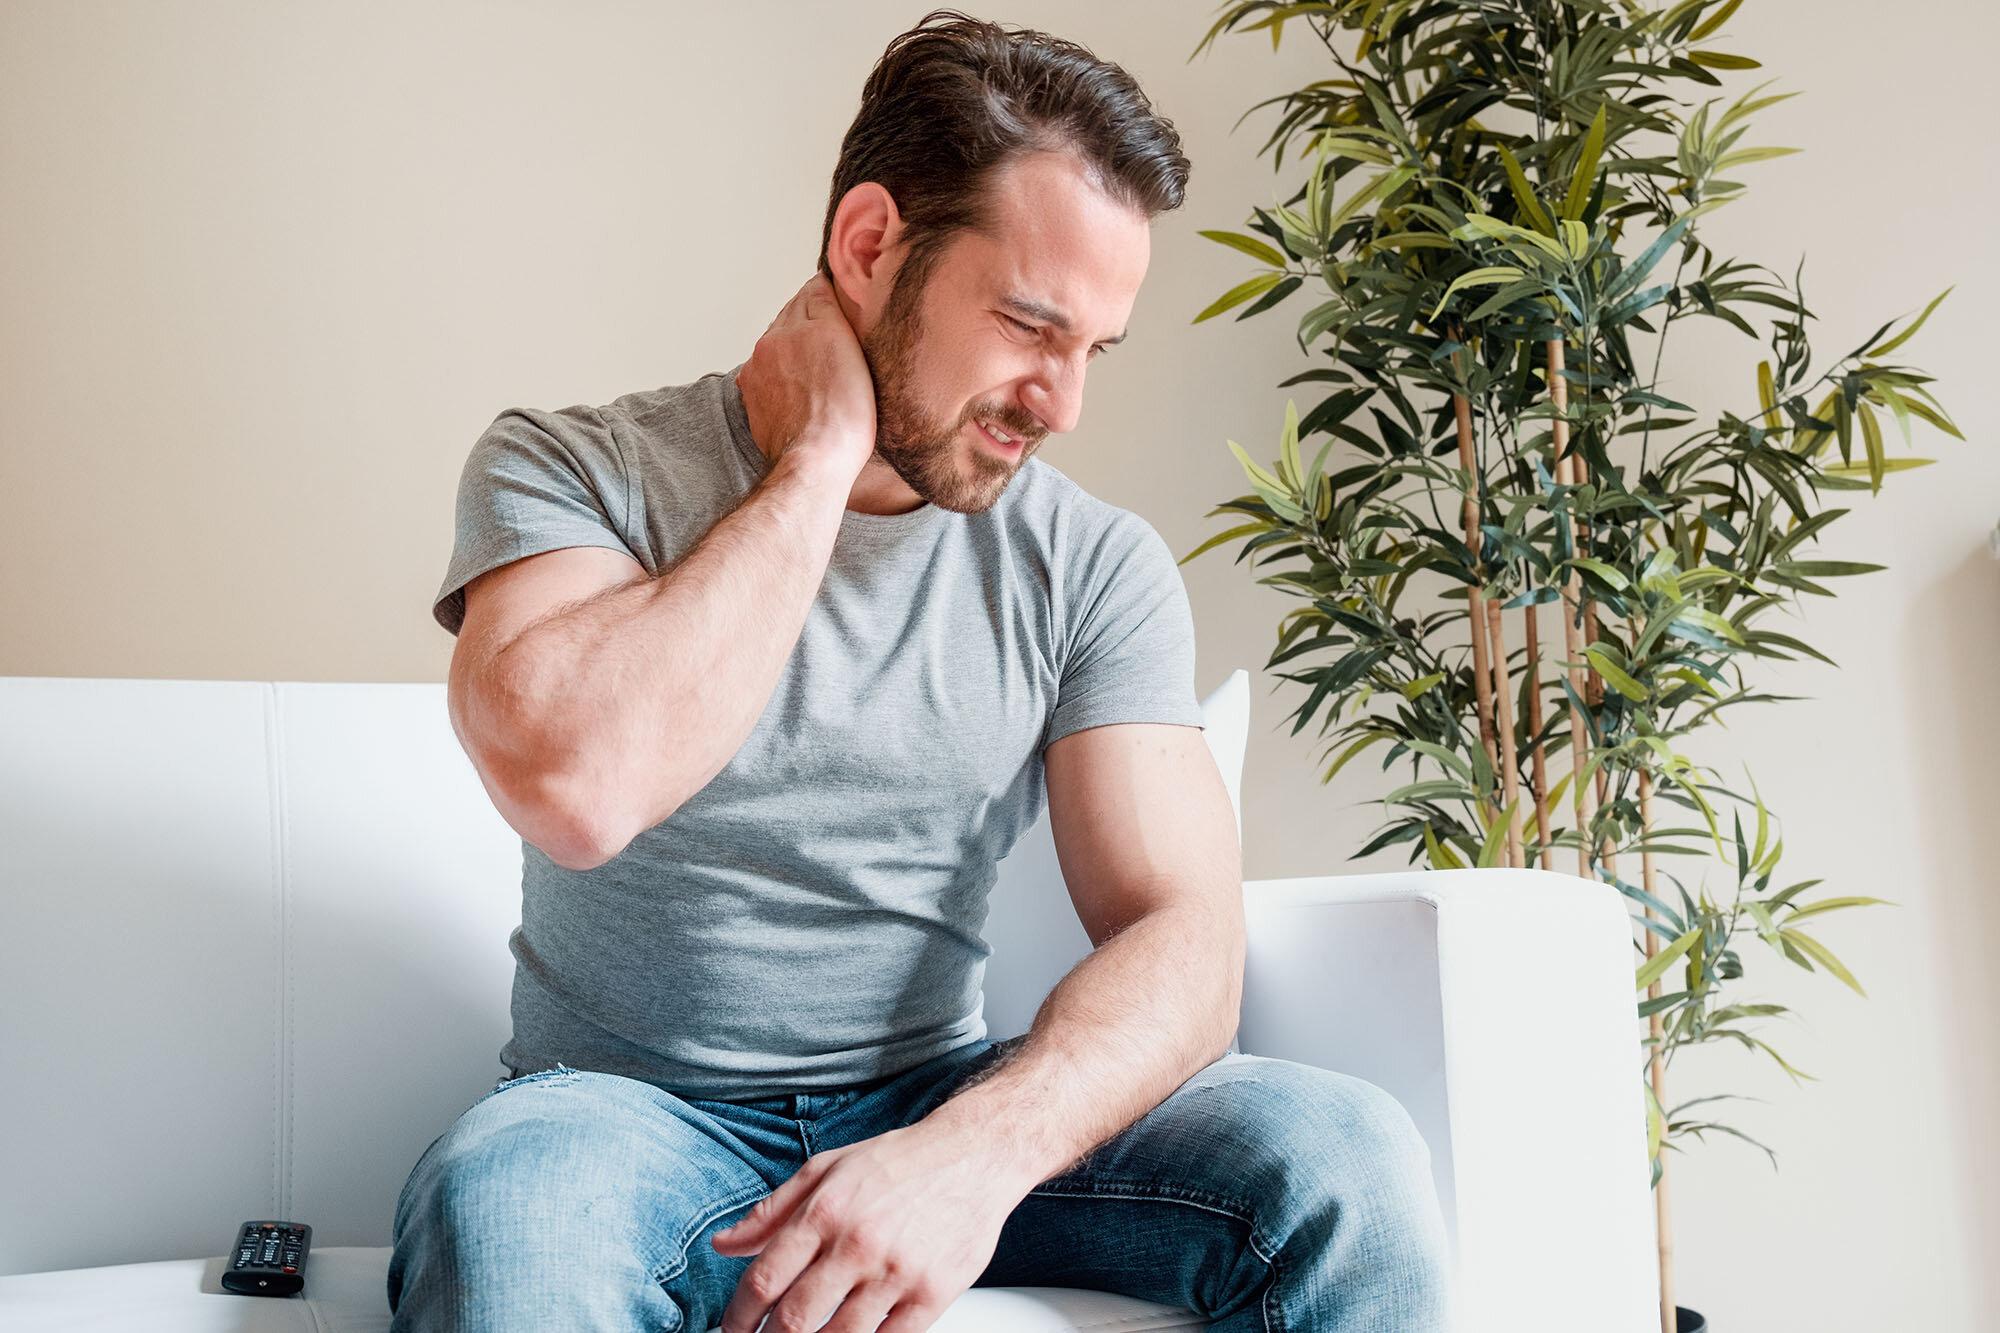 Asheville Fibromyalgia Doctors Guide To Chronic Pain